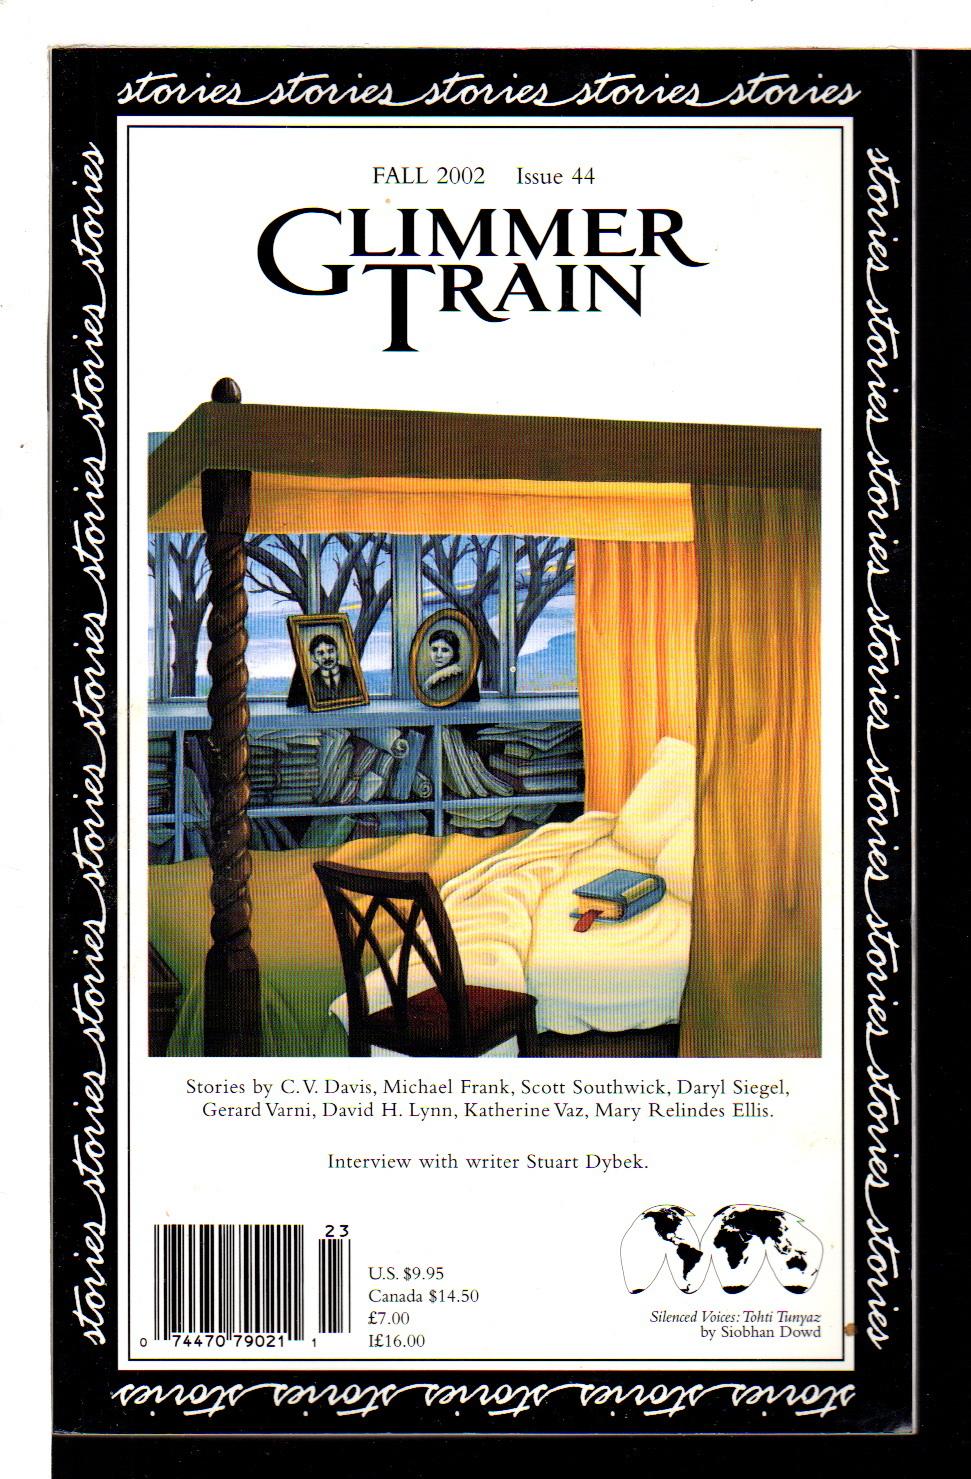 BURMEISTER, SUSAN AND LINDA DAVIES,  EDITORS. - GLIMMER TRAIN: FALL 2002, Issue 44.